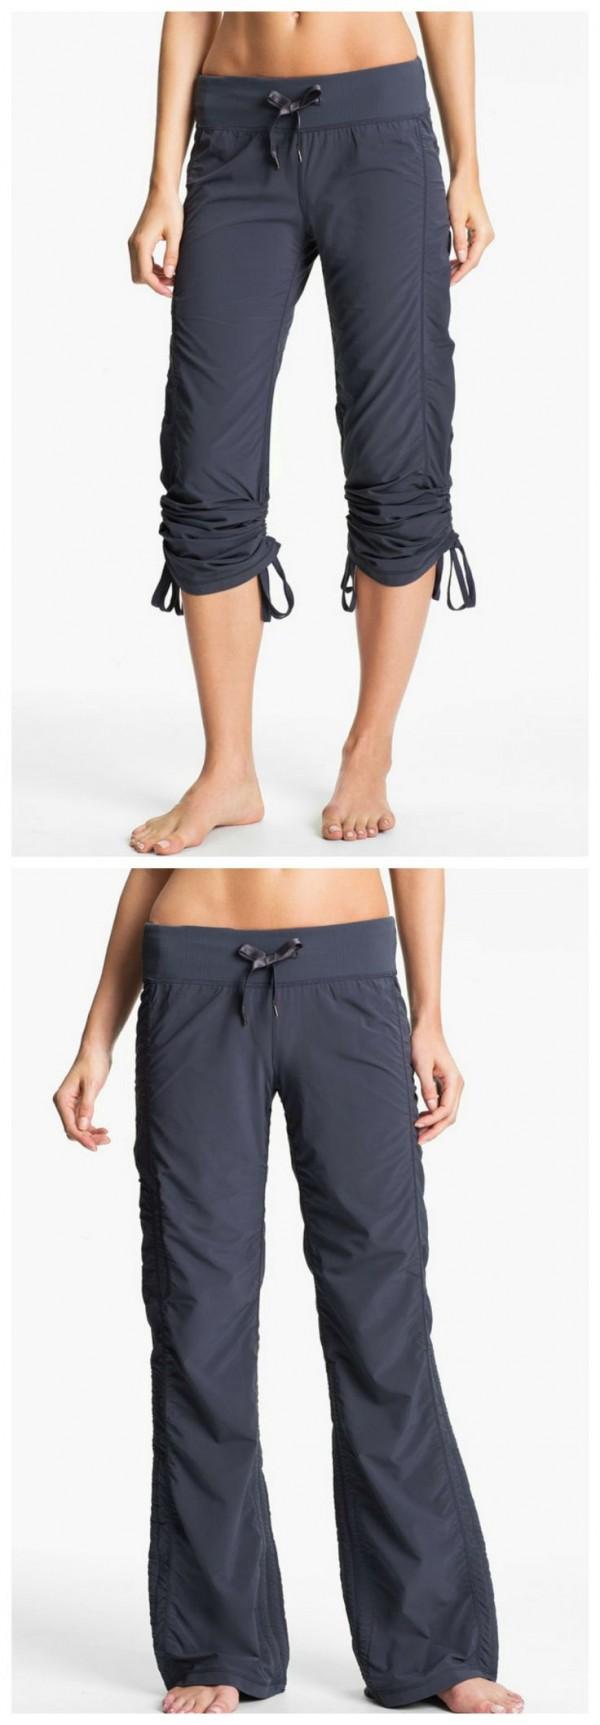 pants convertible